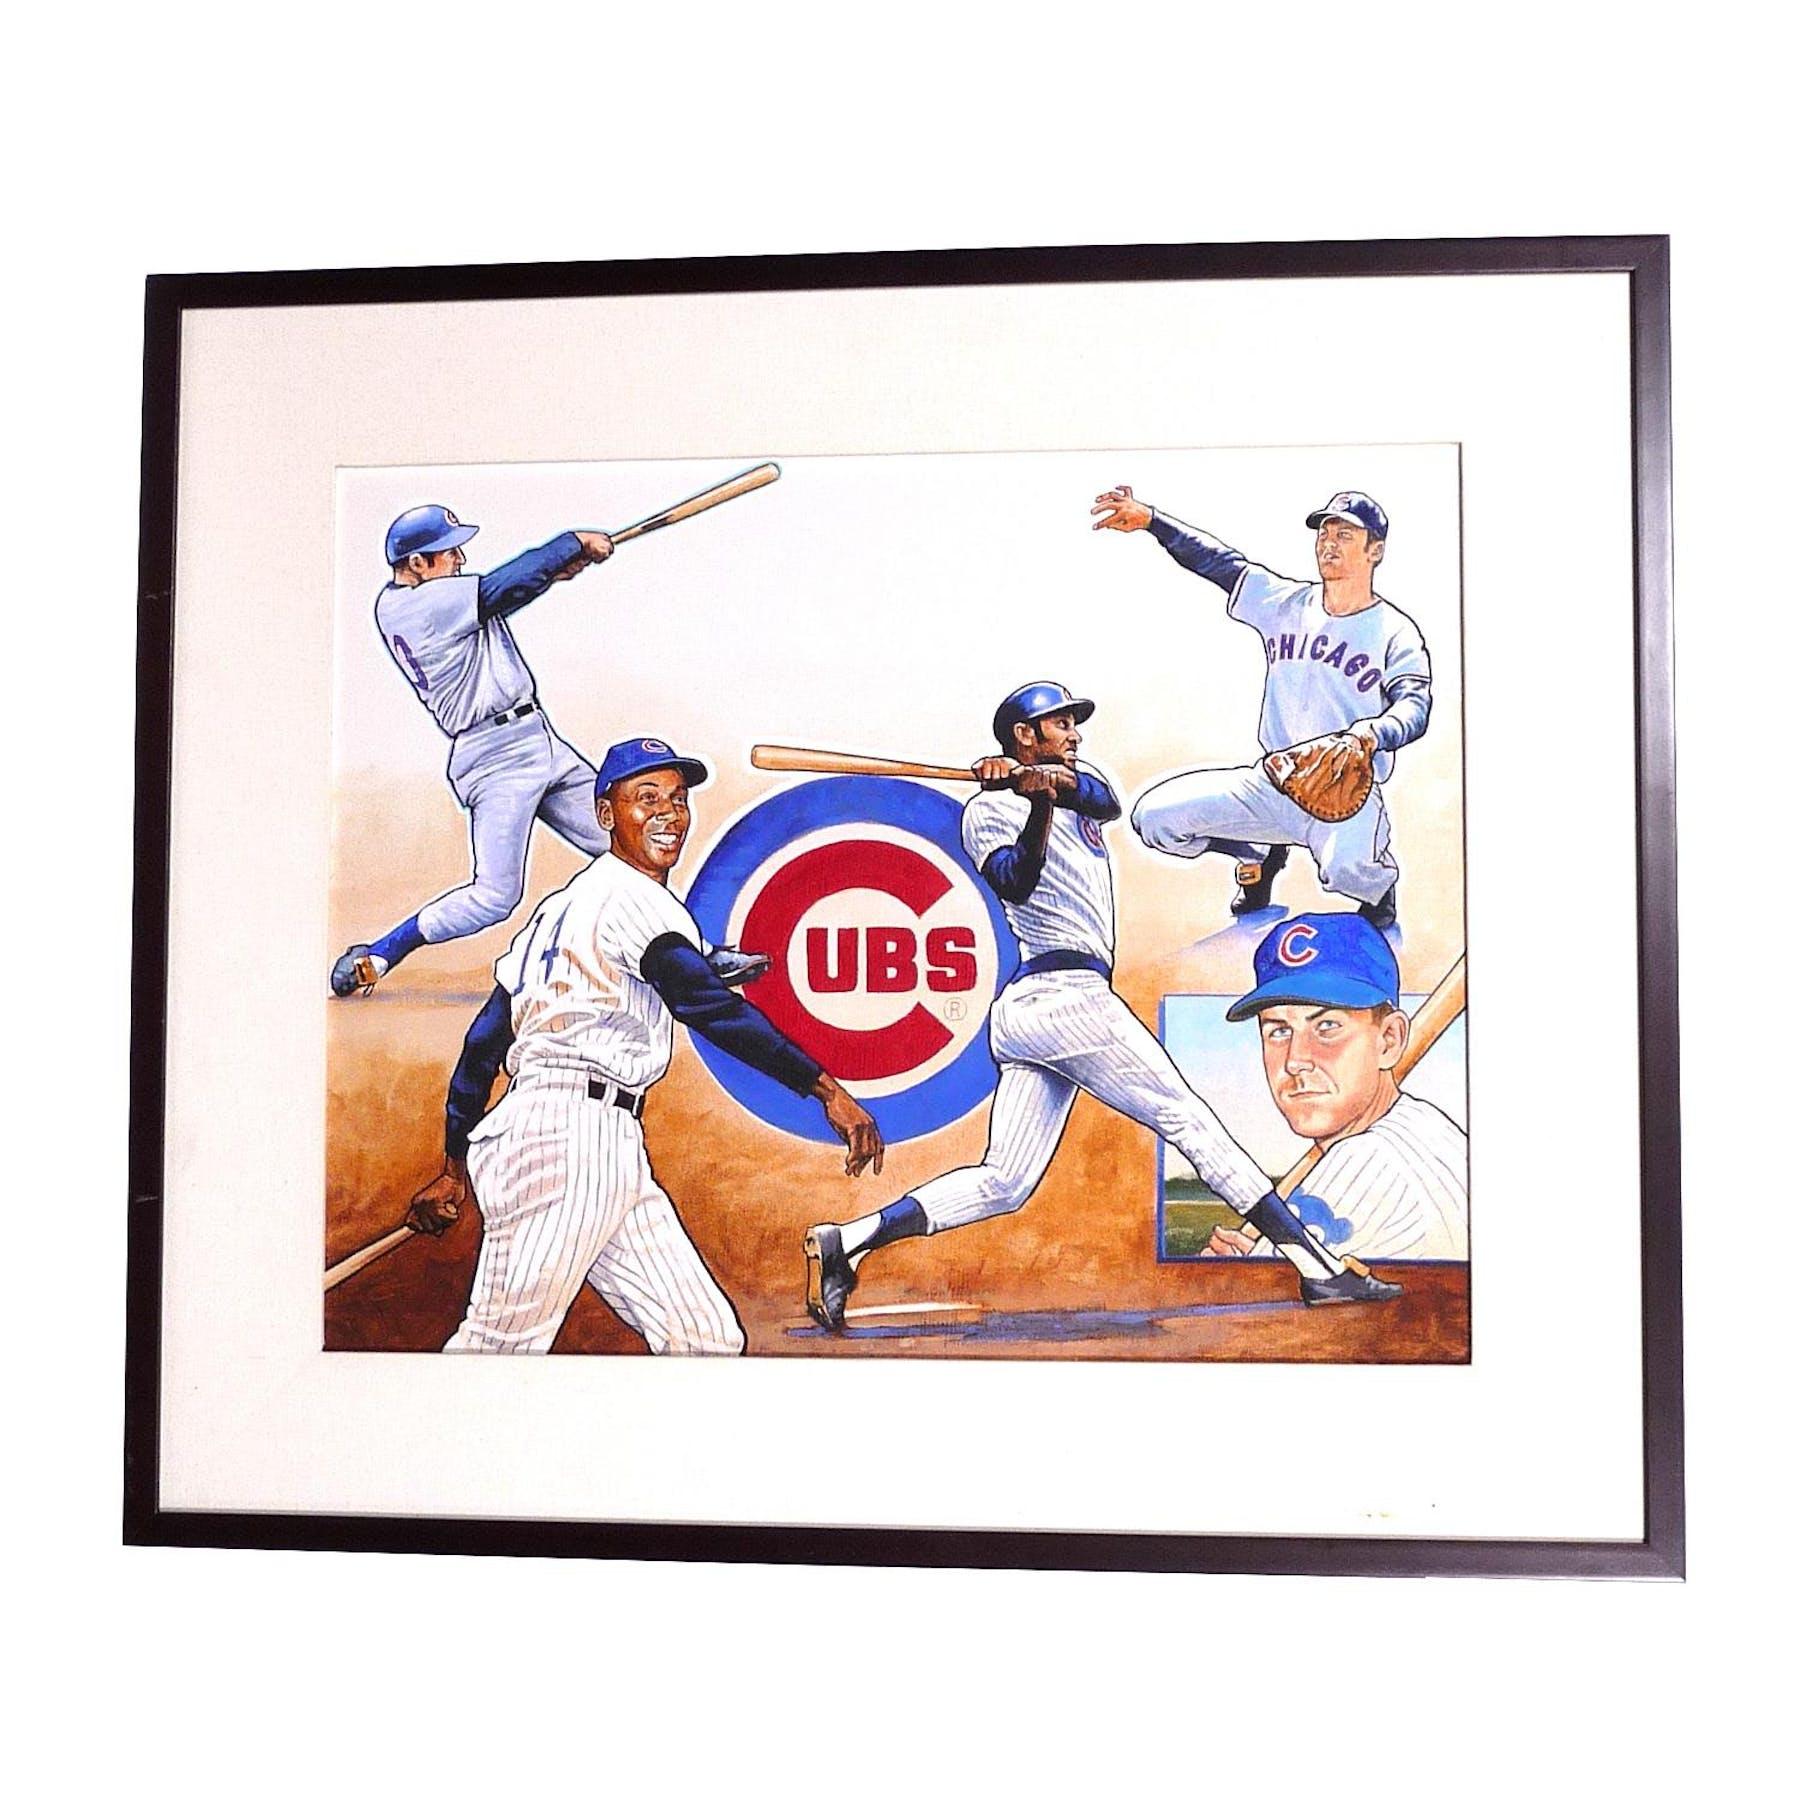 the latest 525f7 e140c Chicago Cubs Team Ernie Banks Upper Deck 22 X 26 Framed Original Art